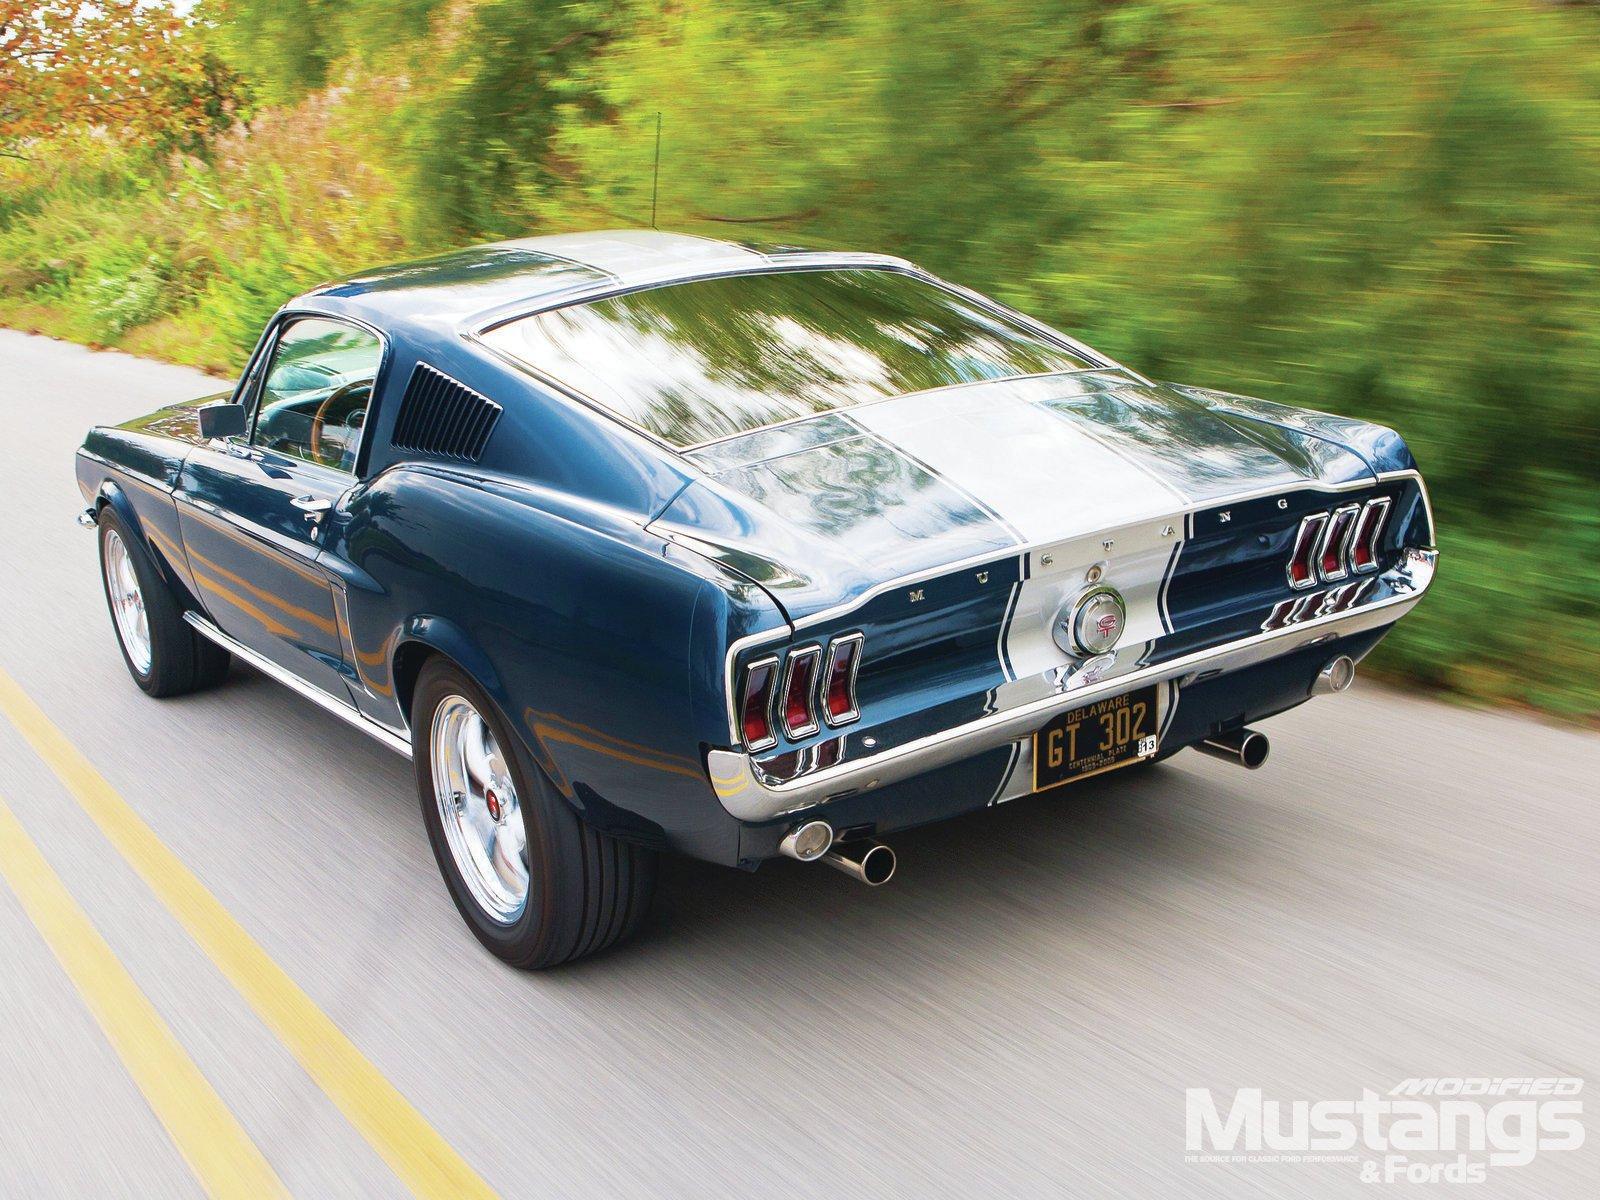 1968 Ford Mustang Fastback Hotrod Streetrod Hot Rod Street Usa 1600x1200 03 Wallpaper